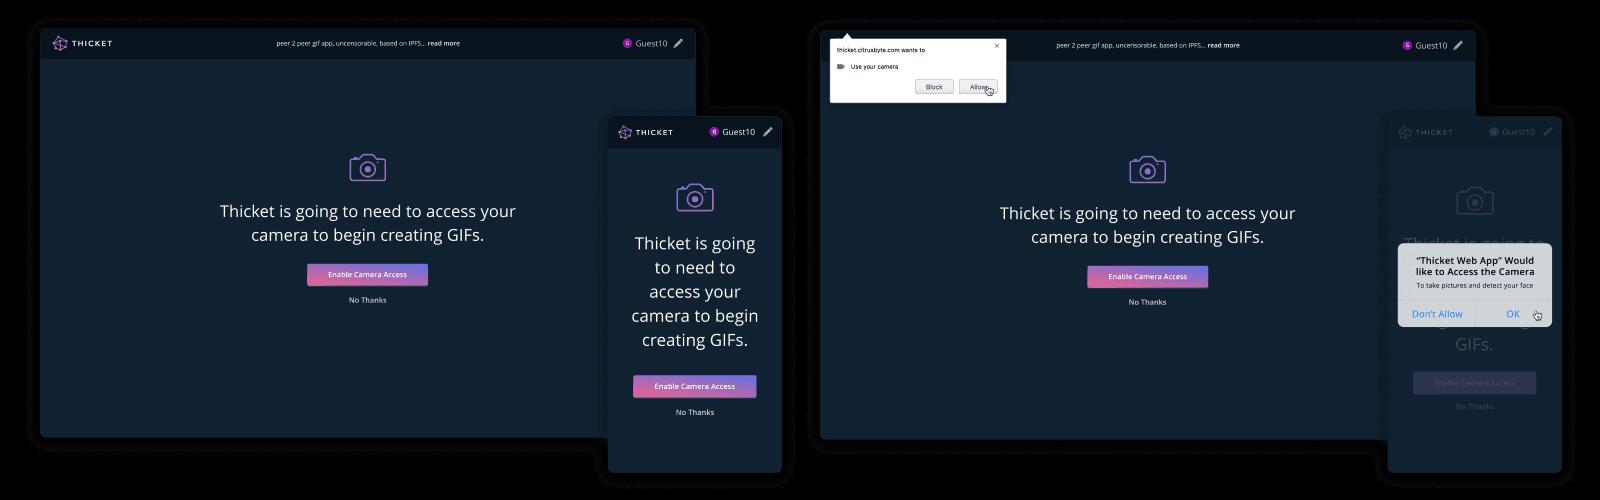 Thicket-Camera-Access-Flat